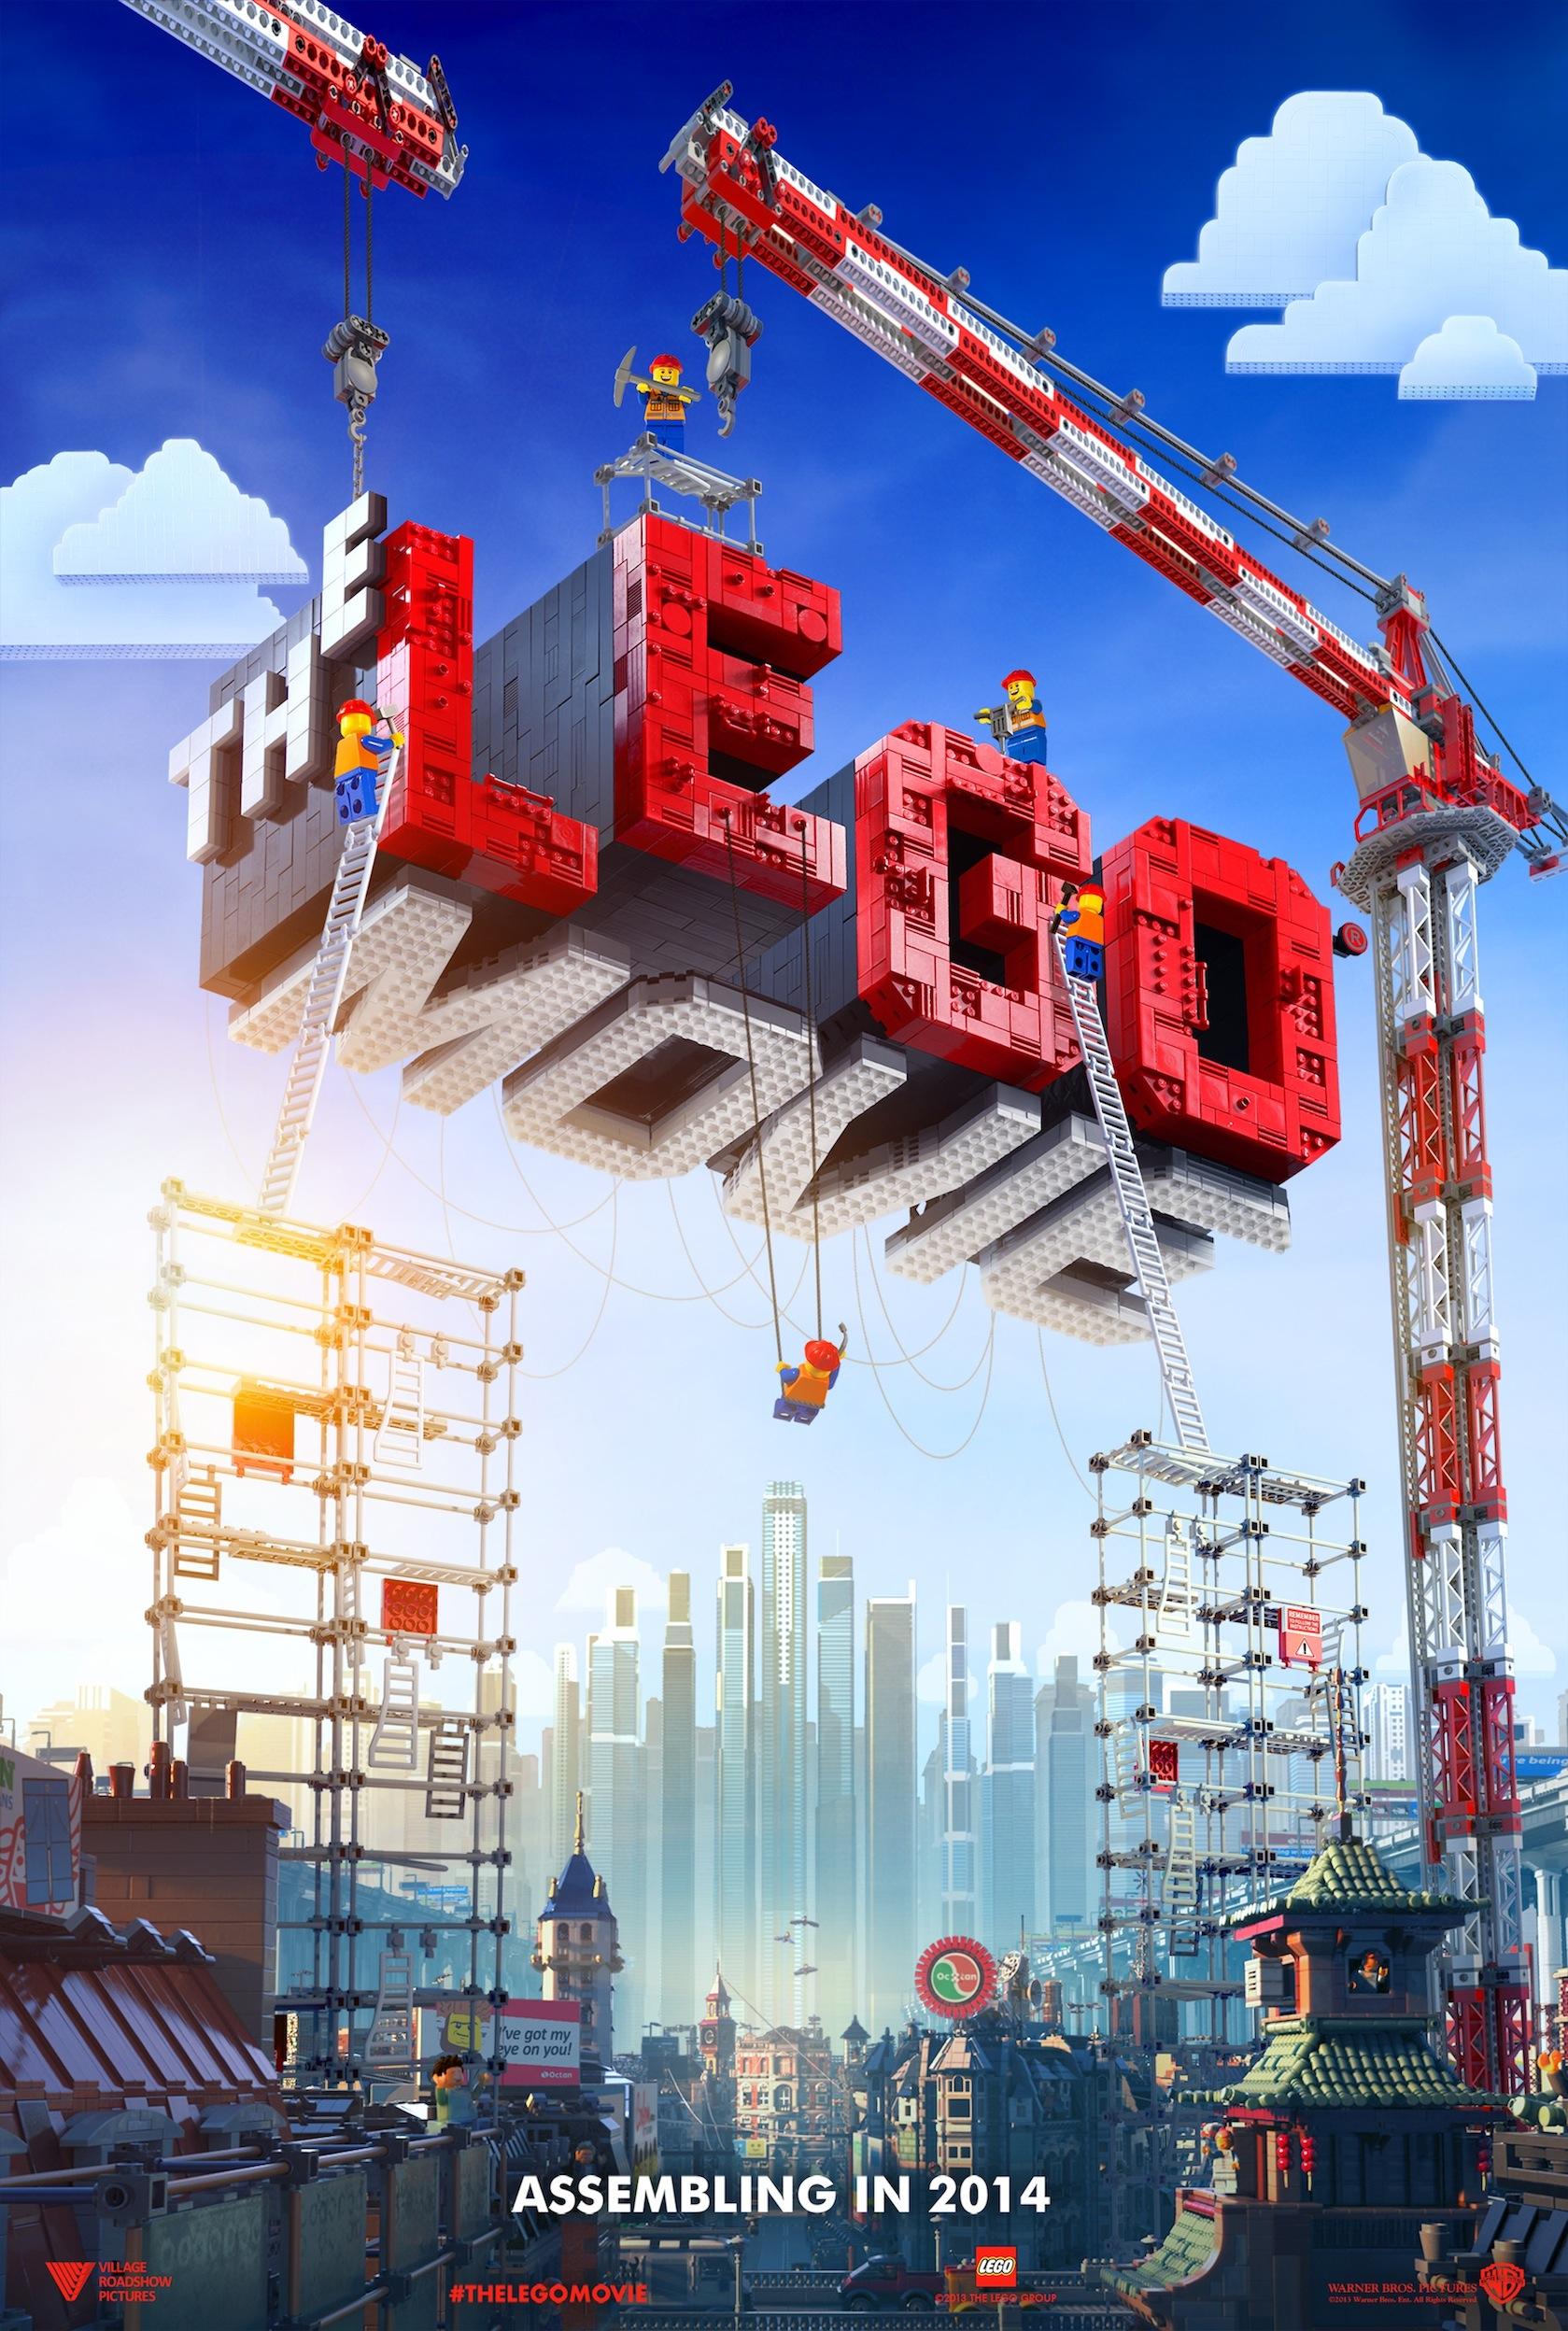 THE LEGO MOVIE teaser image